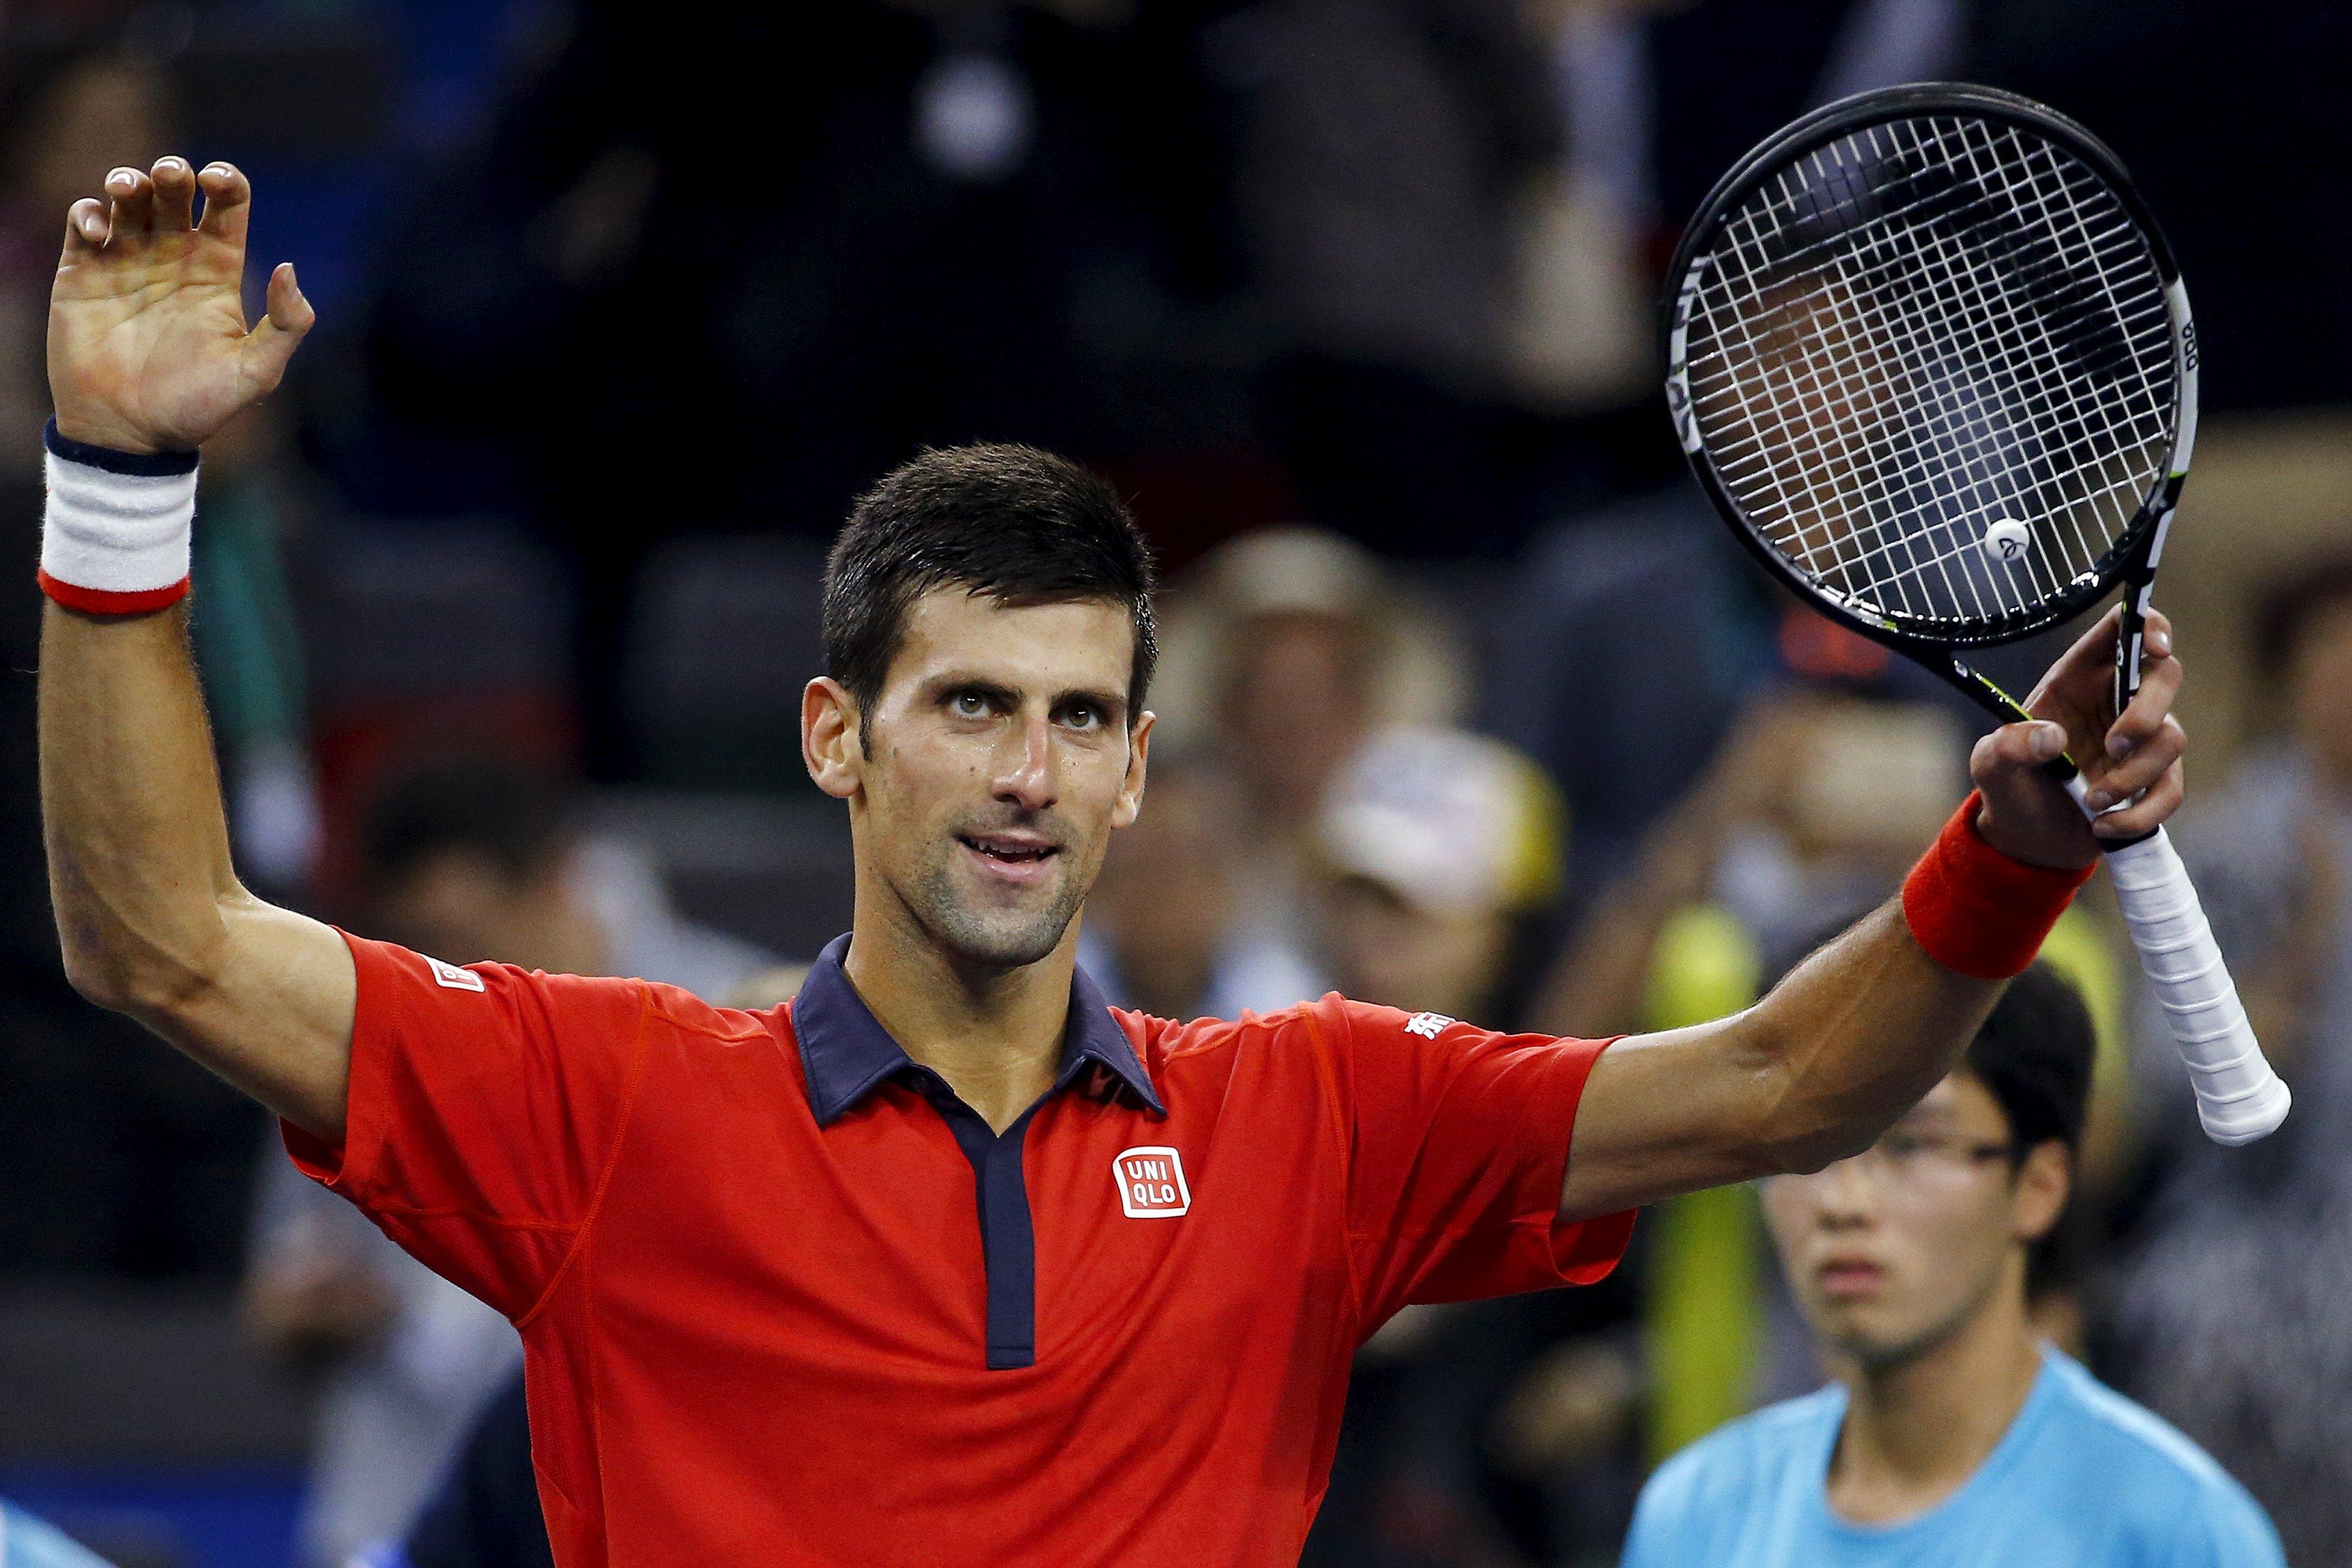 Novak Djokovic of Serbia celebrates after beating Andy Murray of Britain in their men's singles semi-final match at the Shanghai Masters tennis tournament in Shanghai, China, October 17, 2015. REUTERS/Damir Sagolj